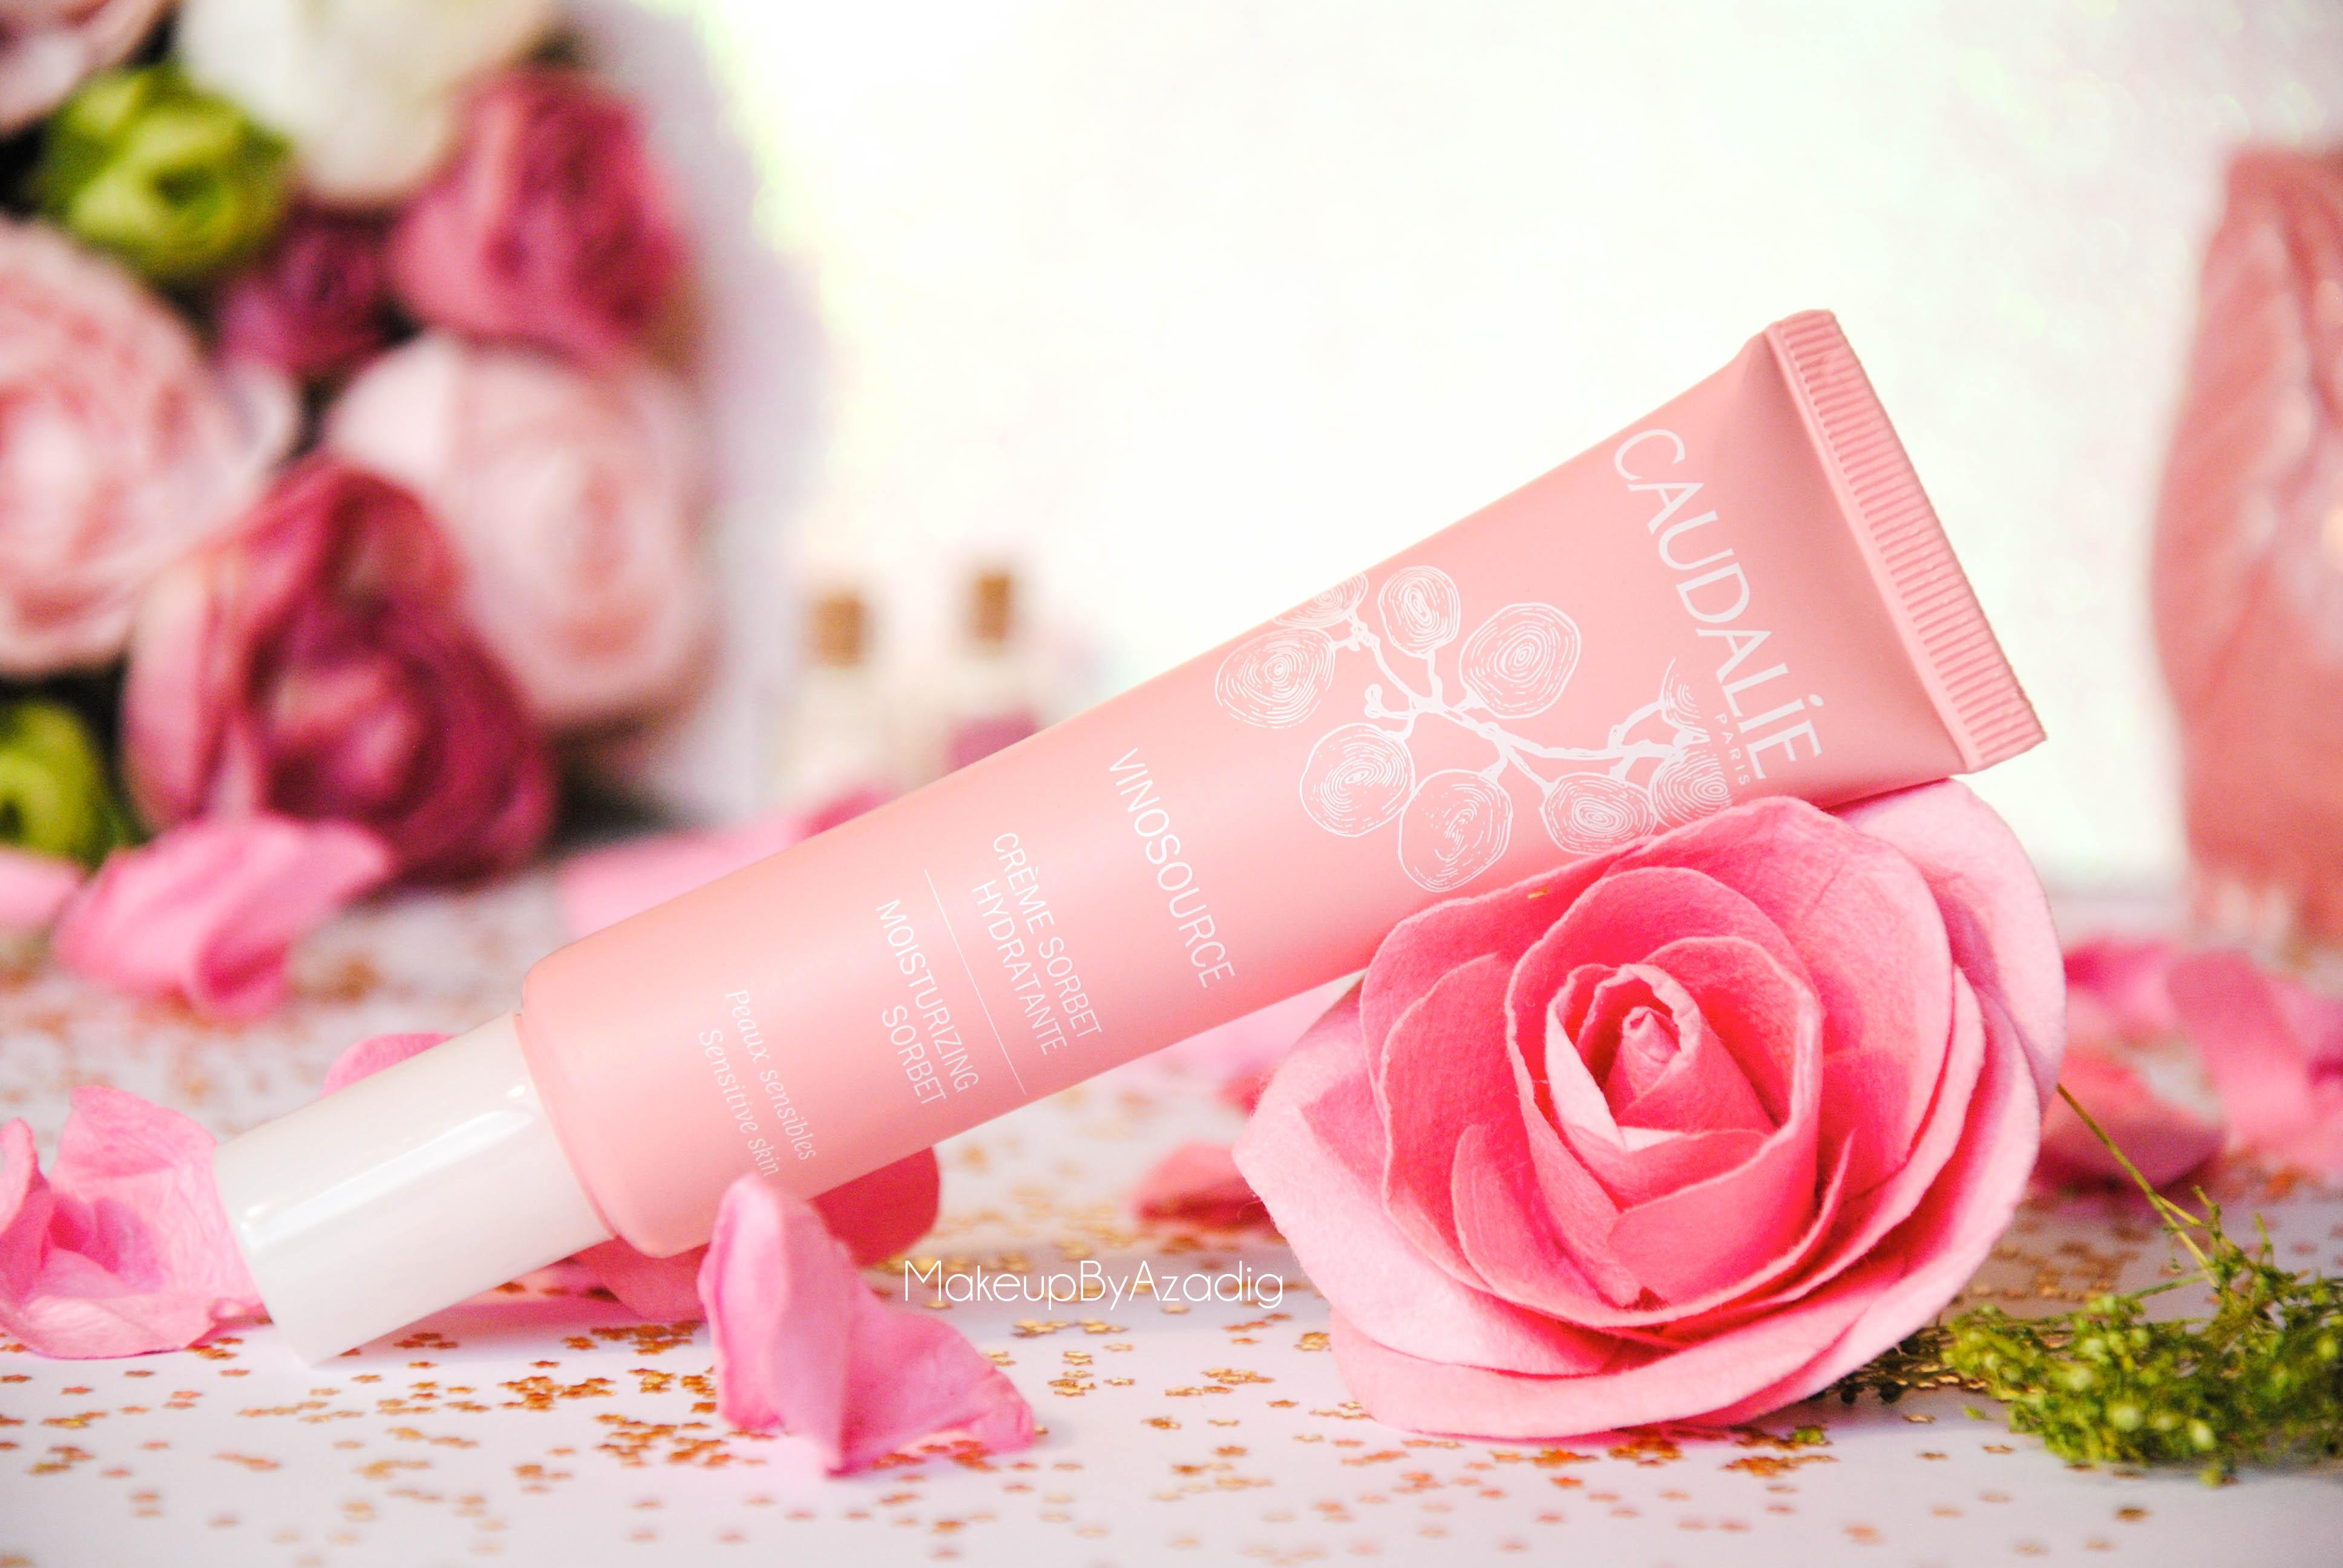 best creme hydratante vinosource caudalie avis revue doctipharma makeupbyazadig